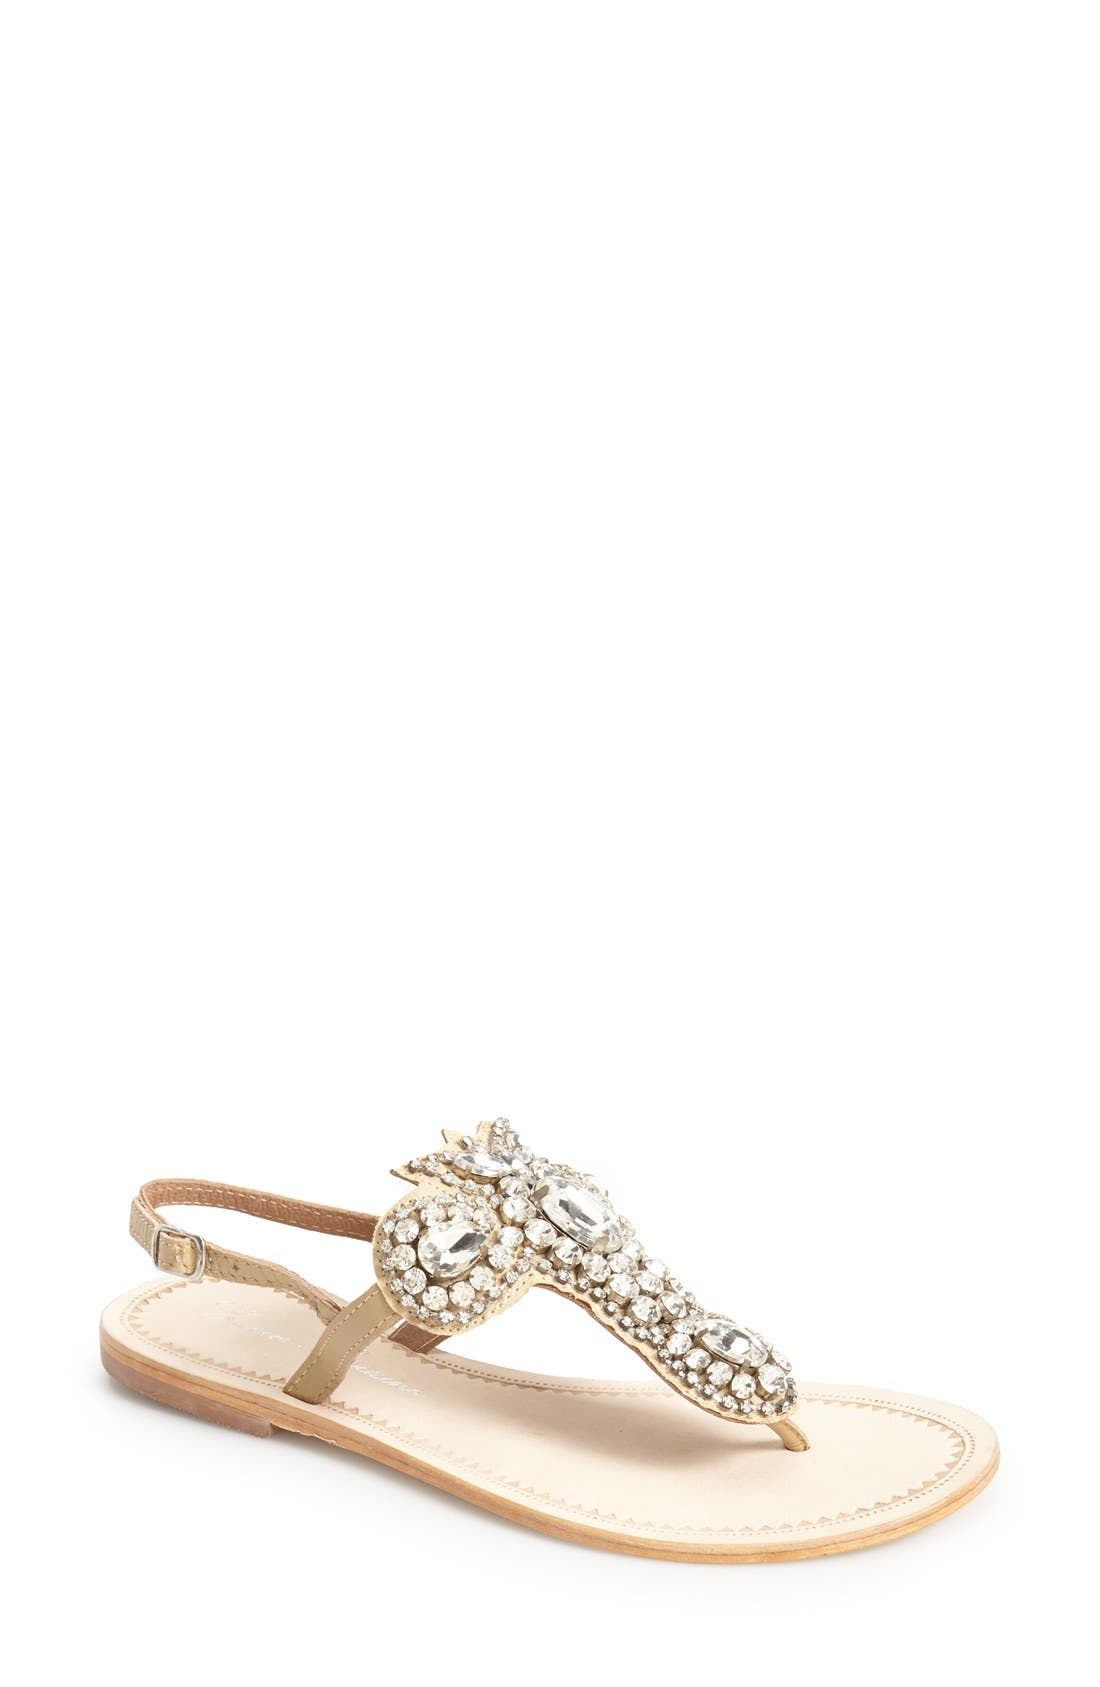 Main Image - Lauren Lorraine 'Ibiza' Crystal Thong Sandal (Women)